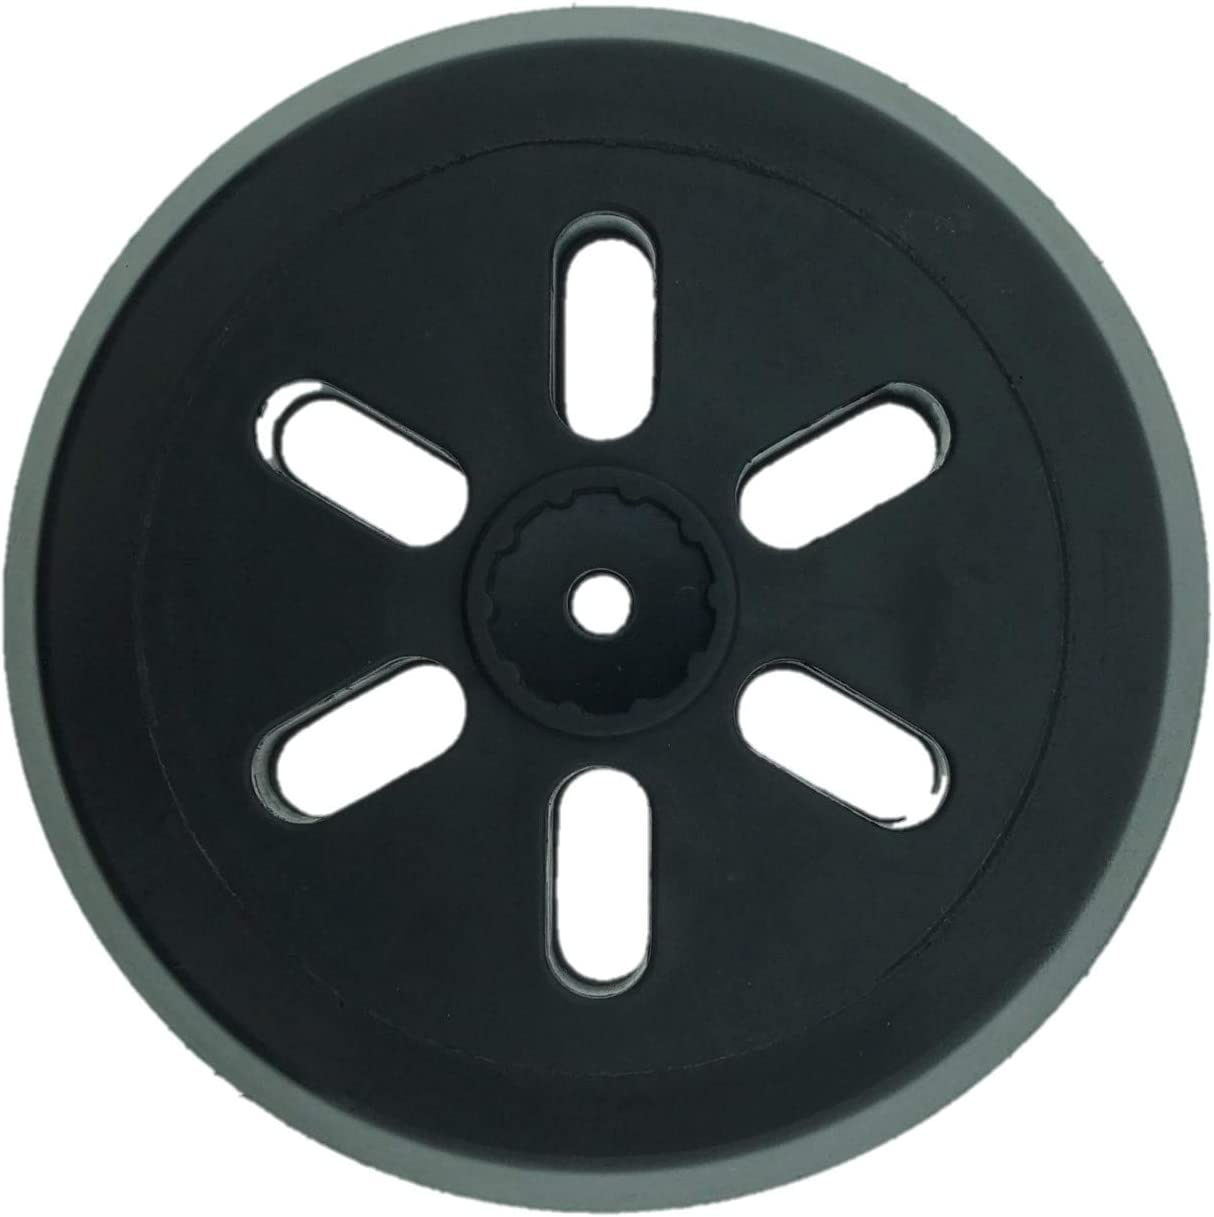 1 x SabreCut OSSCPB420 150mm 6 Hole Random Orbital Sander Hook /& Loop Backing Pad for Bosch GEX 150 AC GEX 150 Turbo PEX 420 Medium